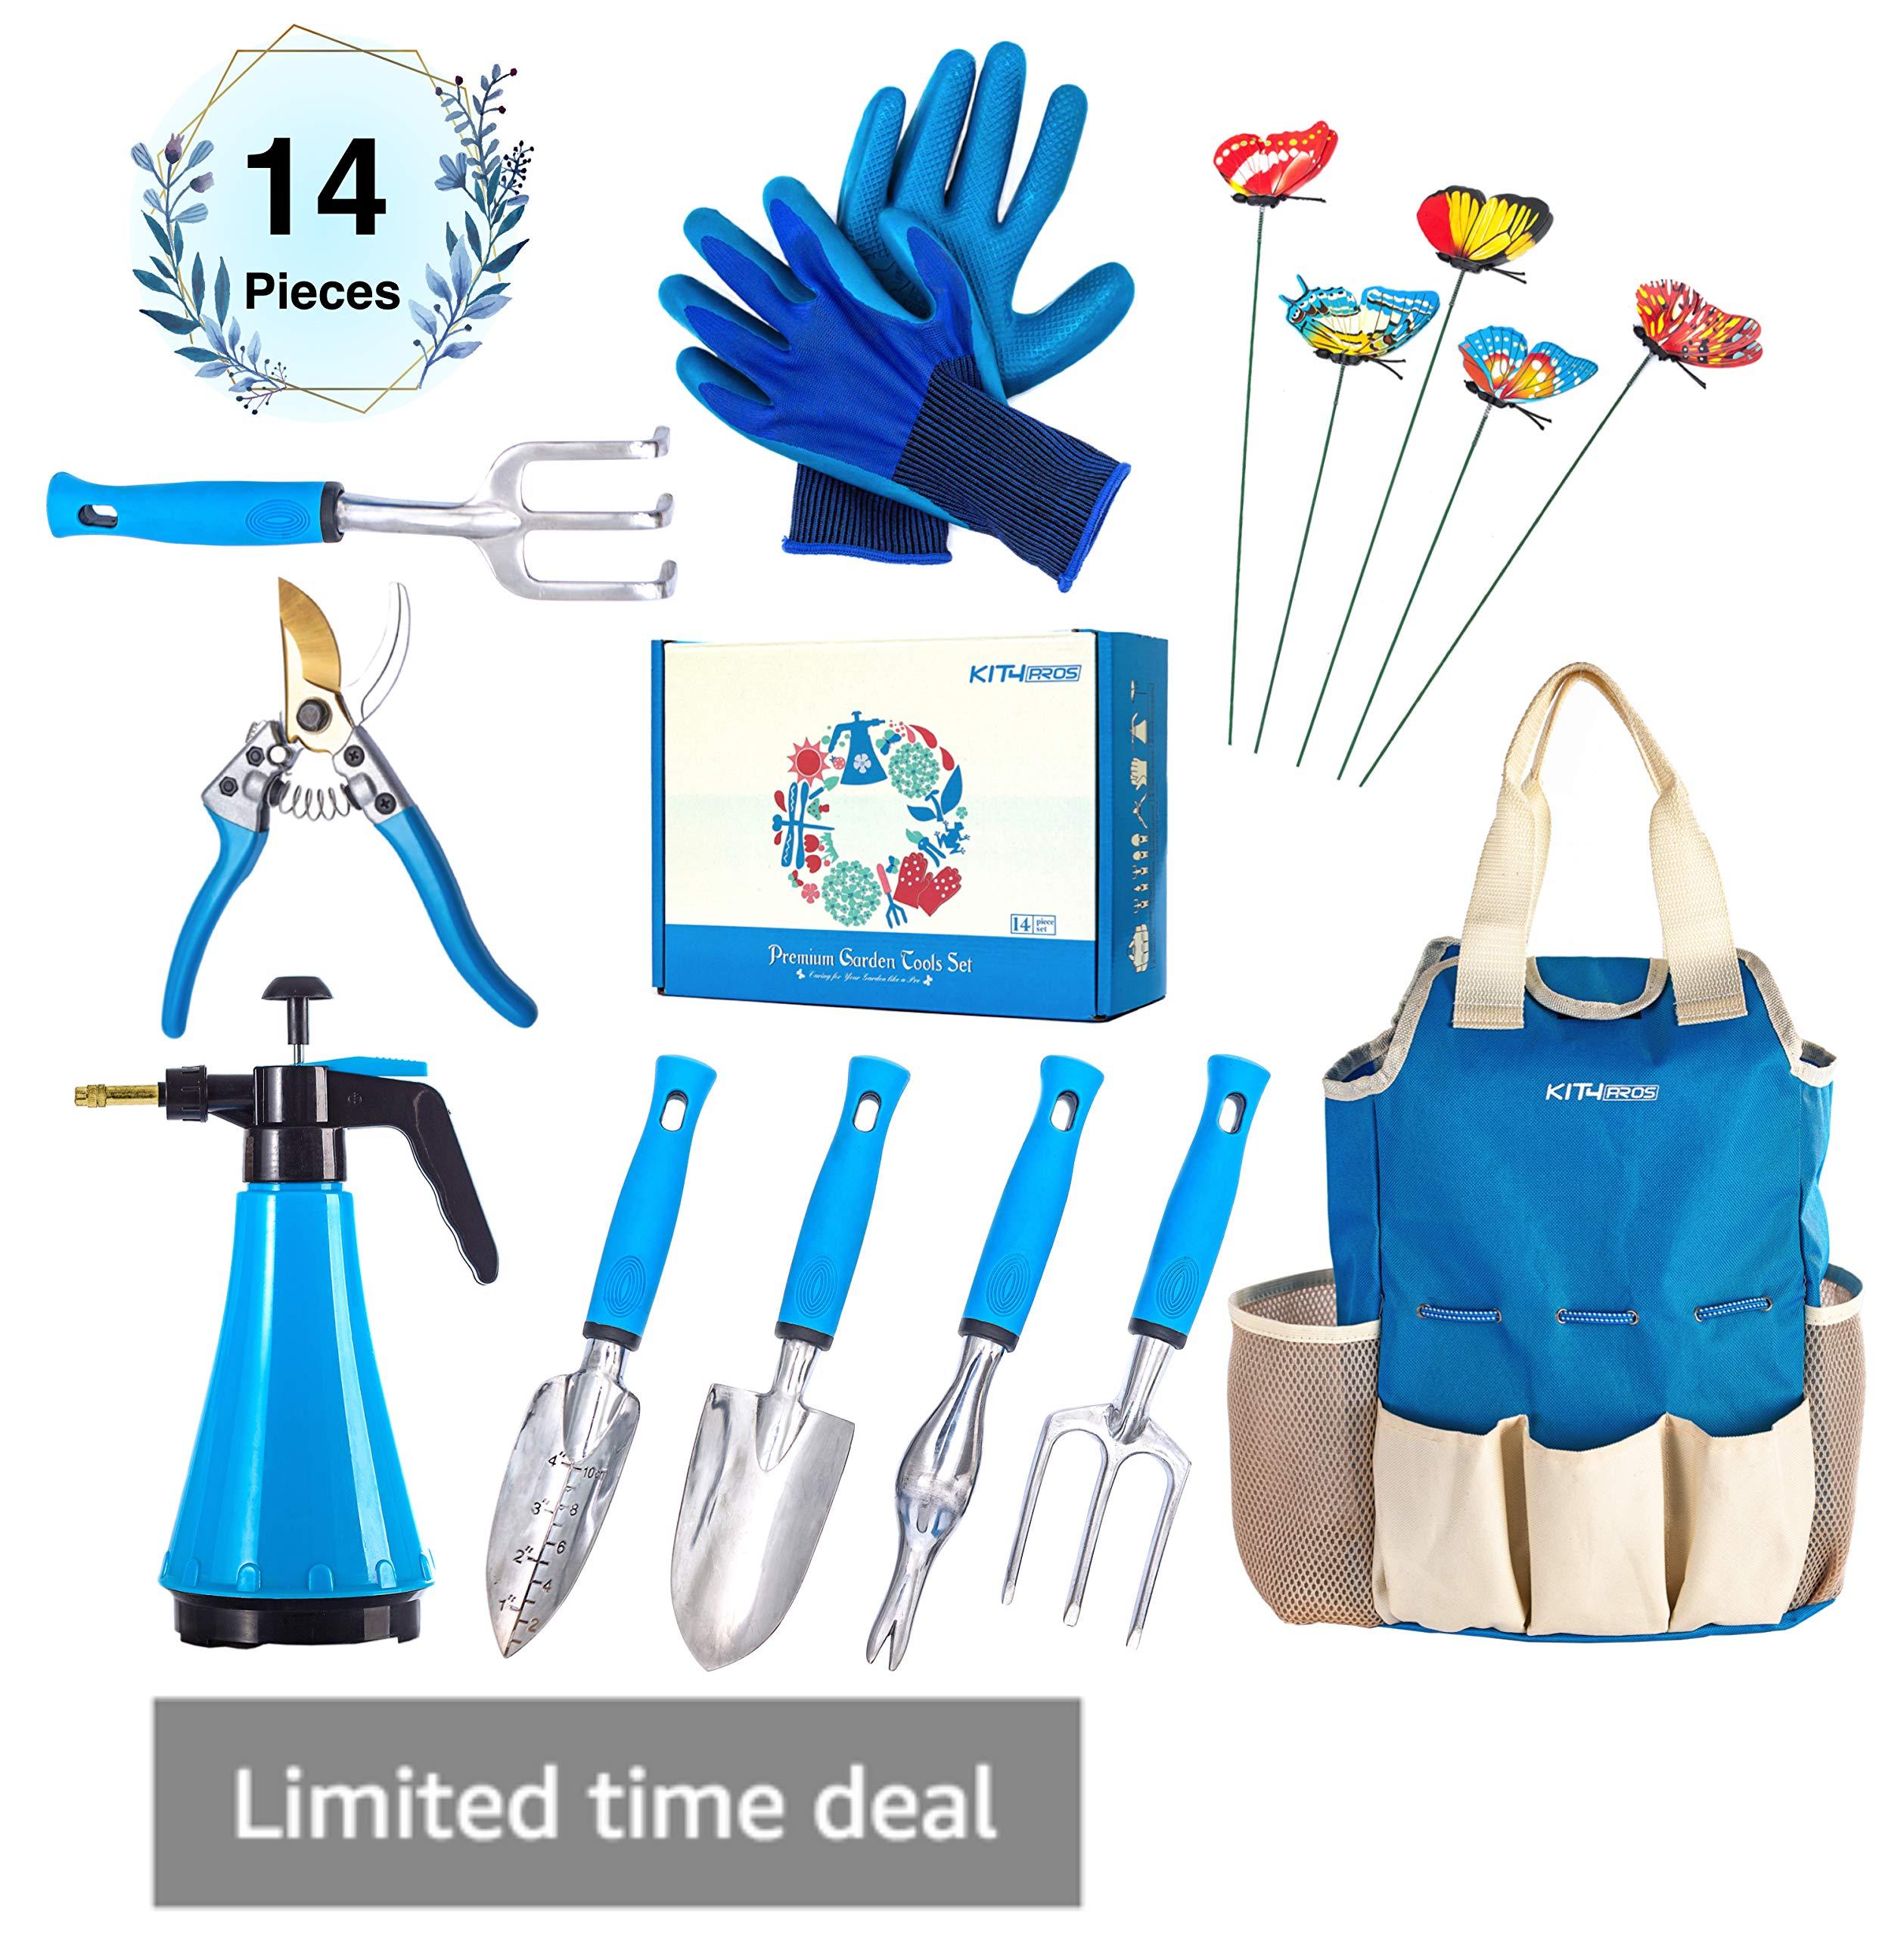 Kit4Pros Premium Garden Tools Set | Gardening Gifts for Women & Men | Heavy Duty Kit w/Ergonomic Handle | Weeder | Cultivator | Trowel | Storage Tote Bag Organizer | Pruning Shears & Gardener Gloves by Kit4Pros